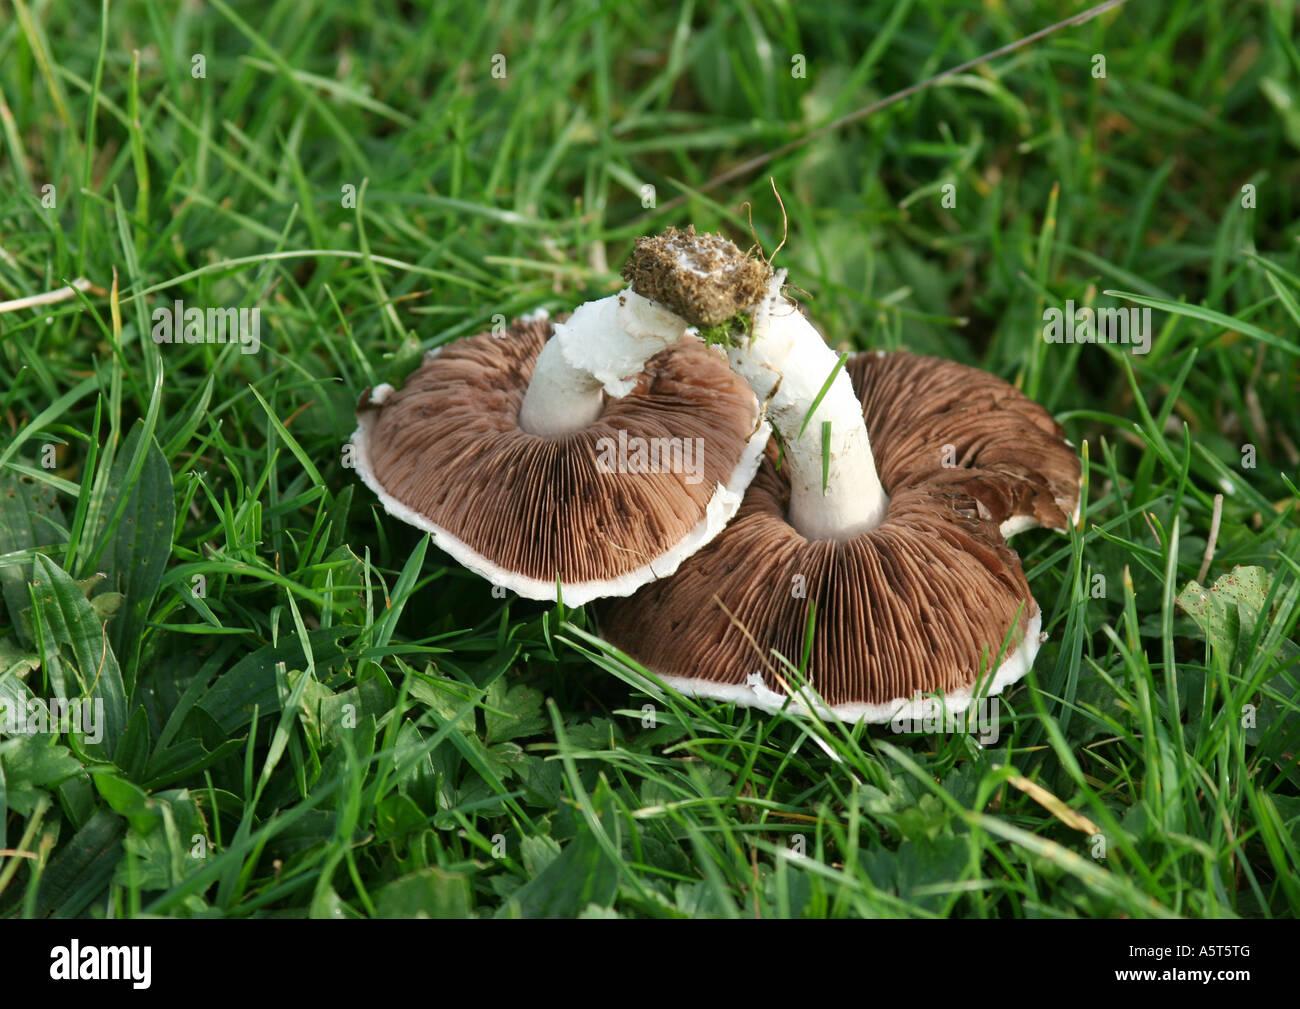 Mushrooms (agaricus campestris) on grass - Stock Image